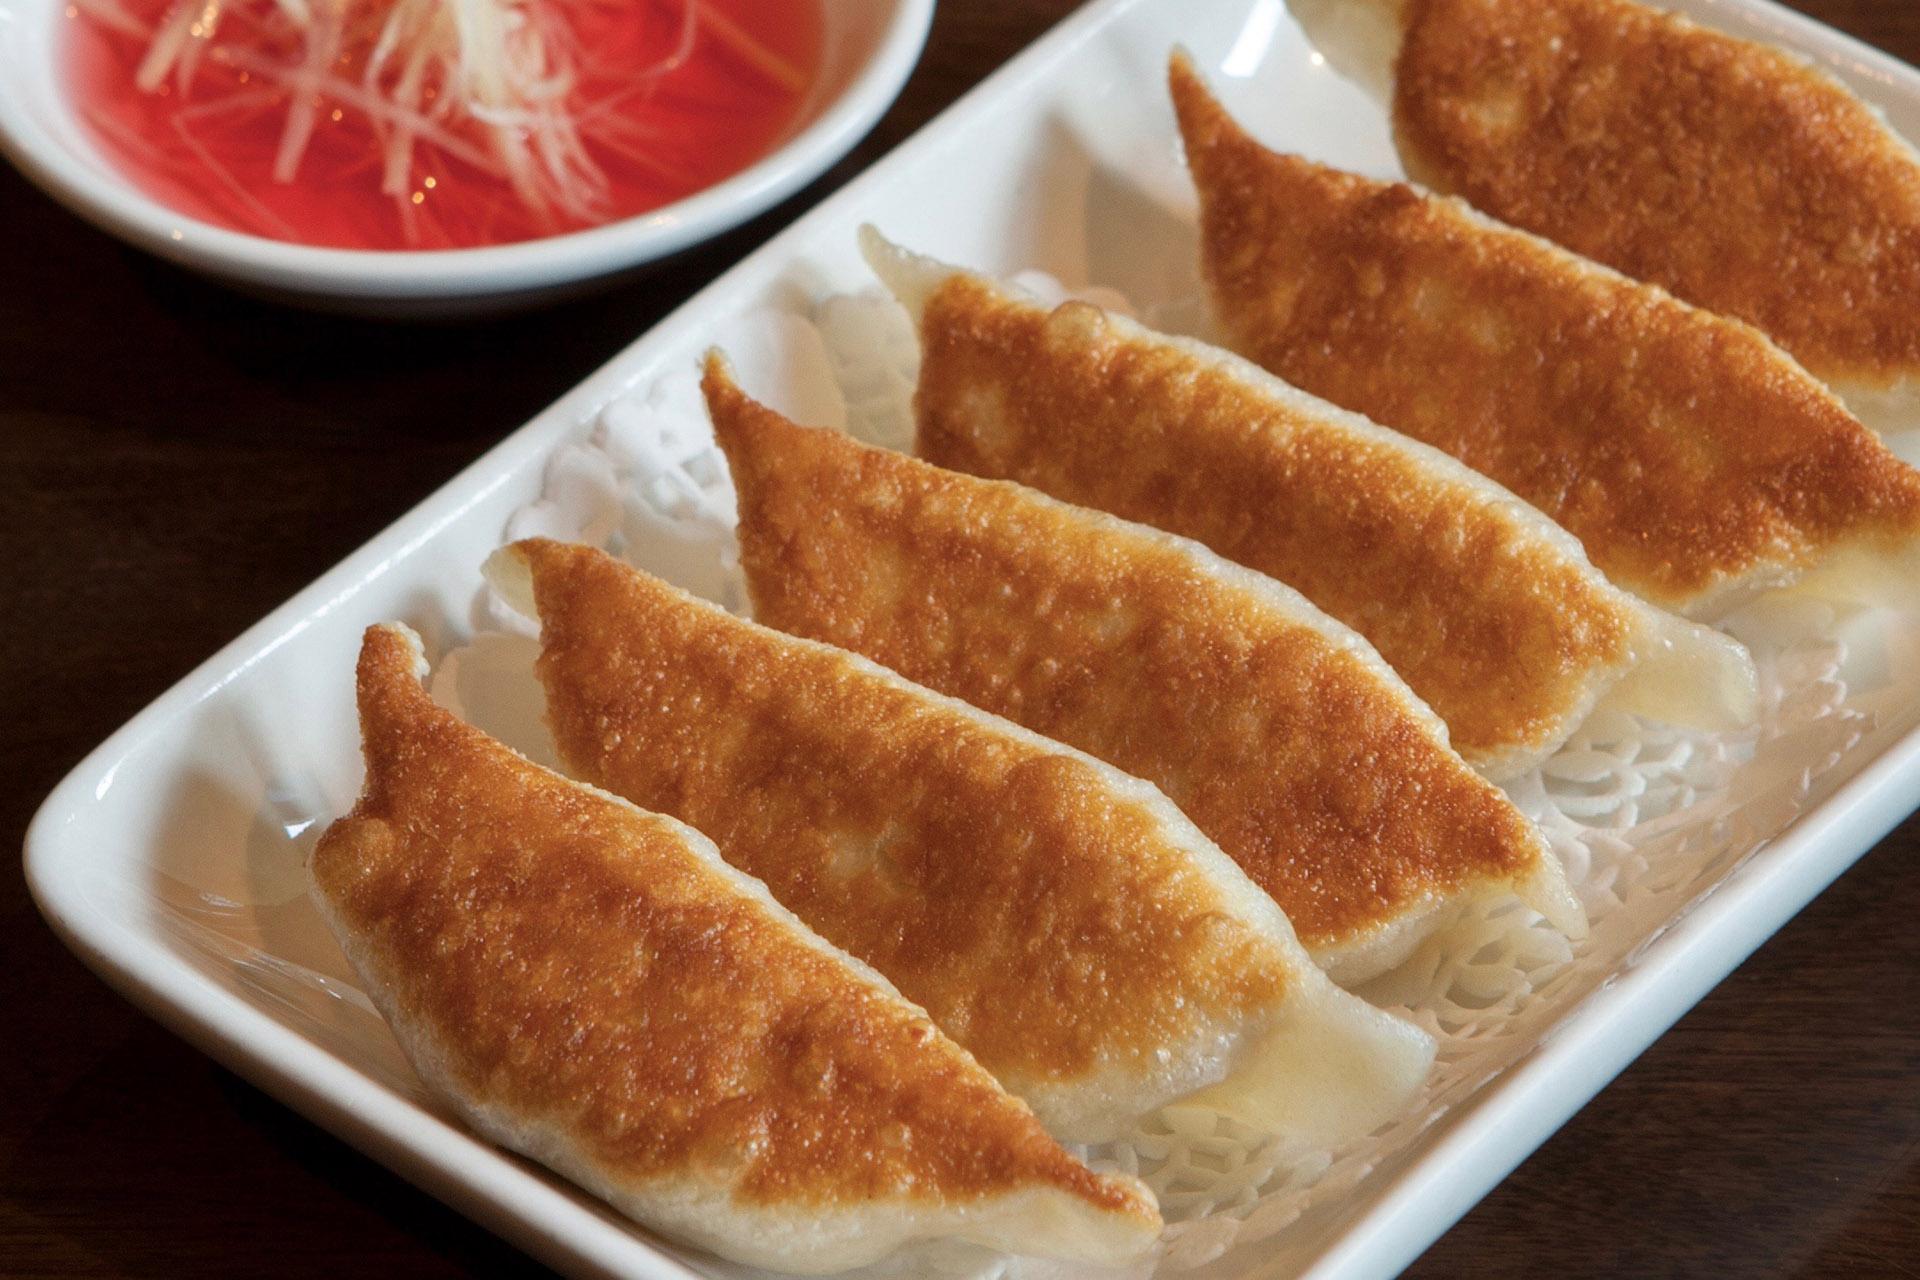 Pan Fried Pork Dumplings [6] at Lee Chen Asian Bistro